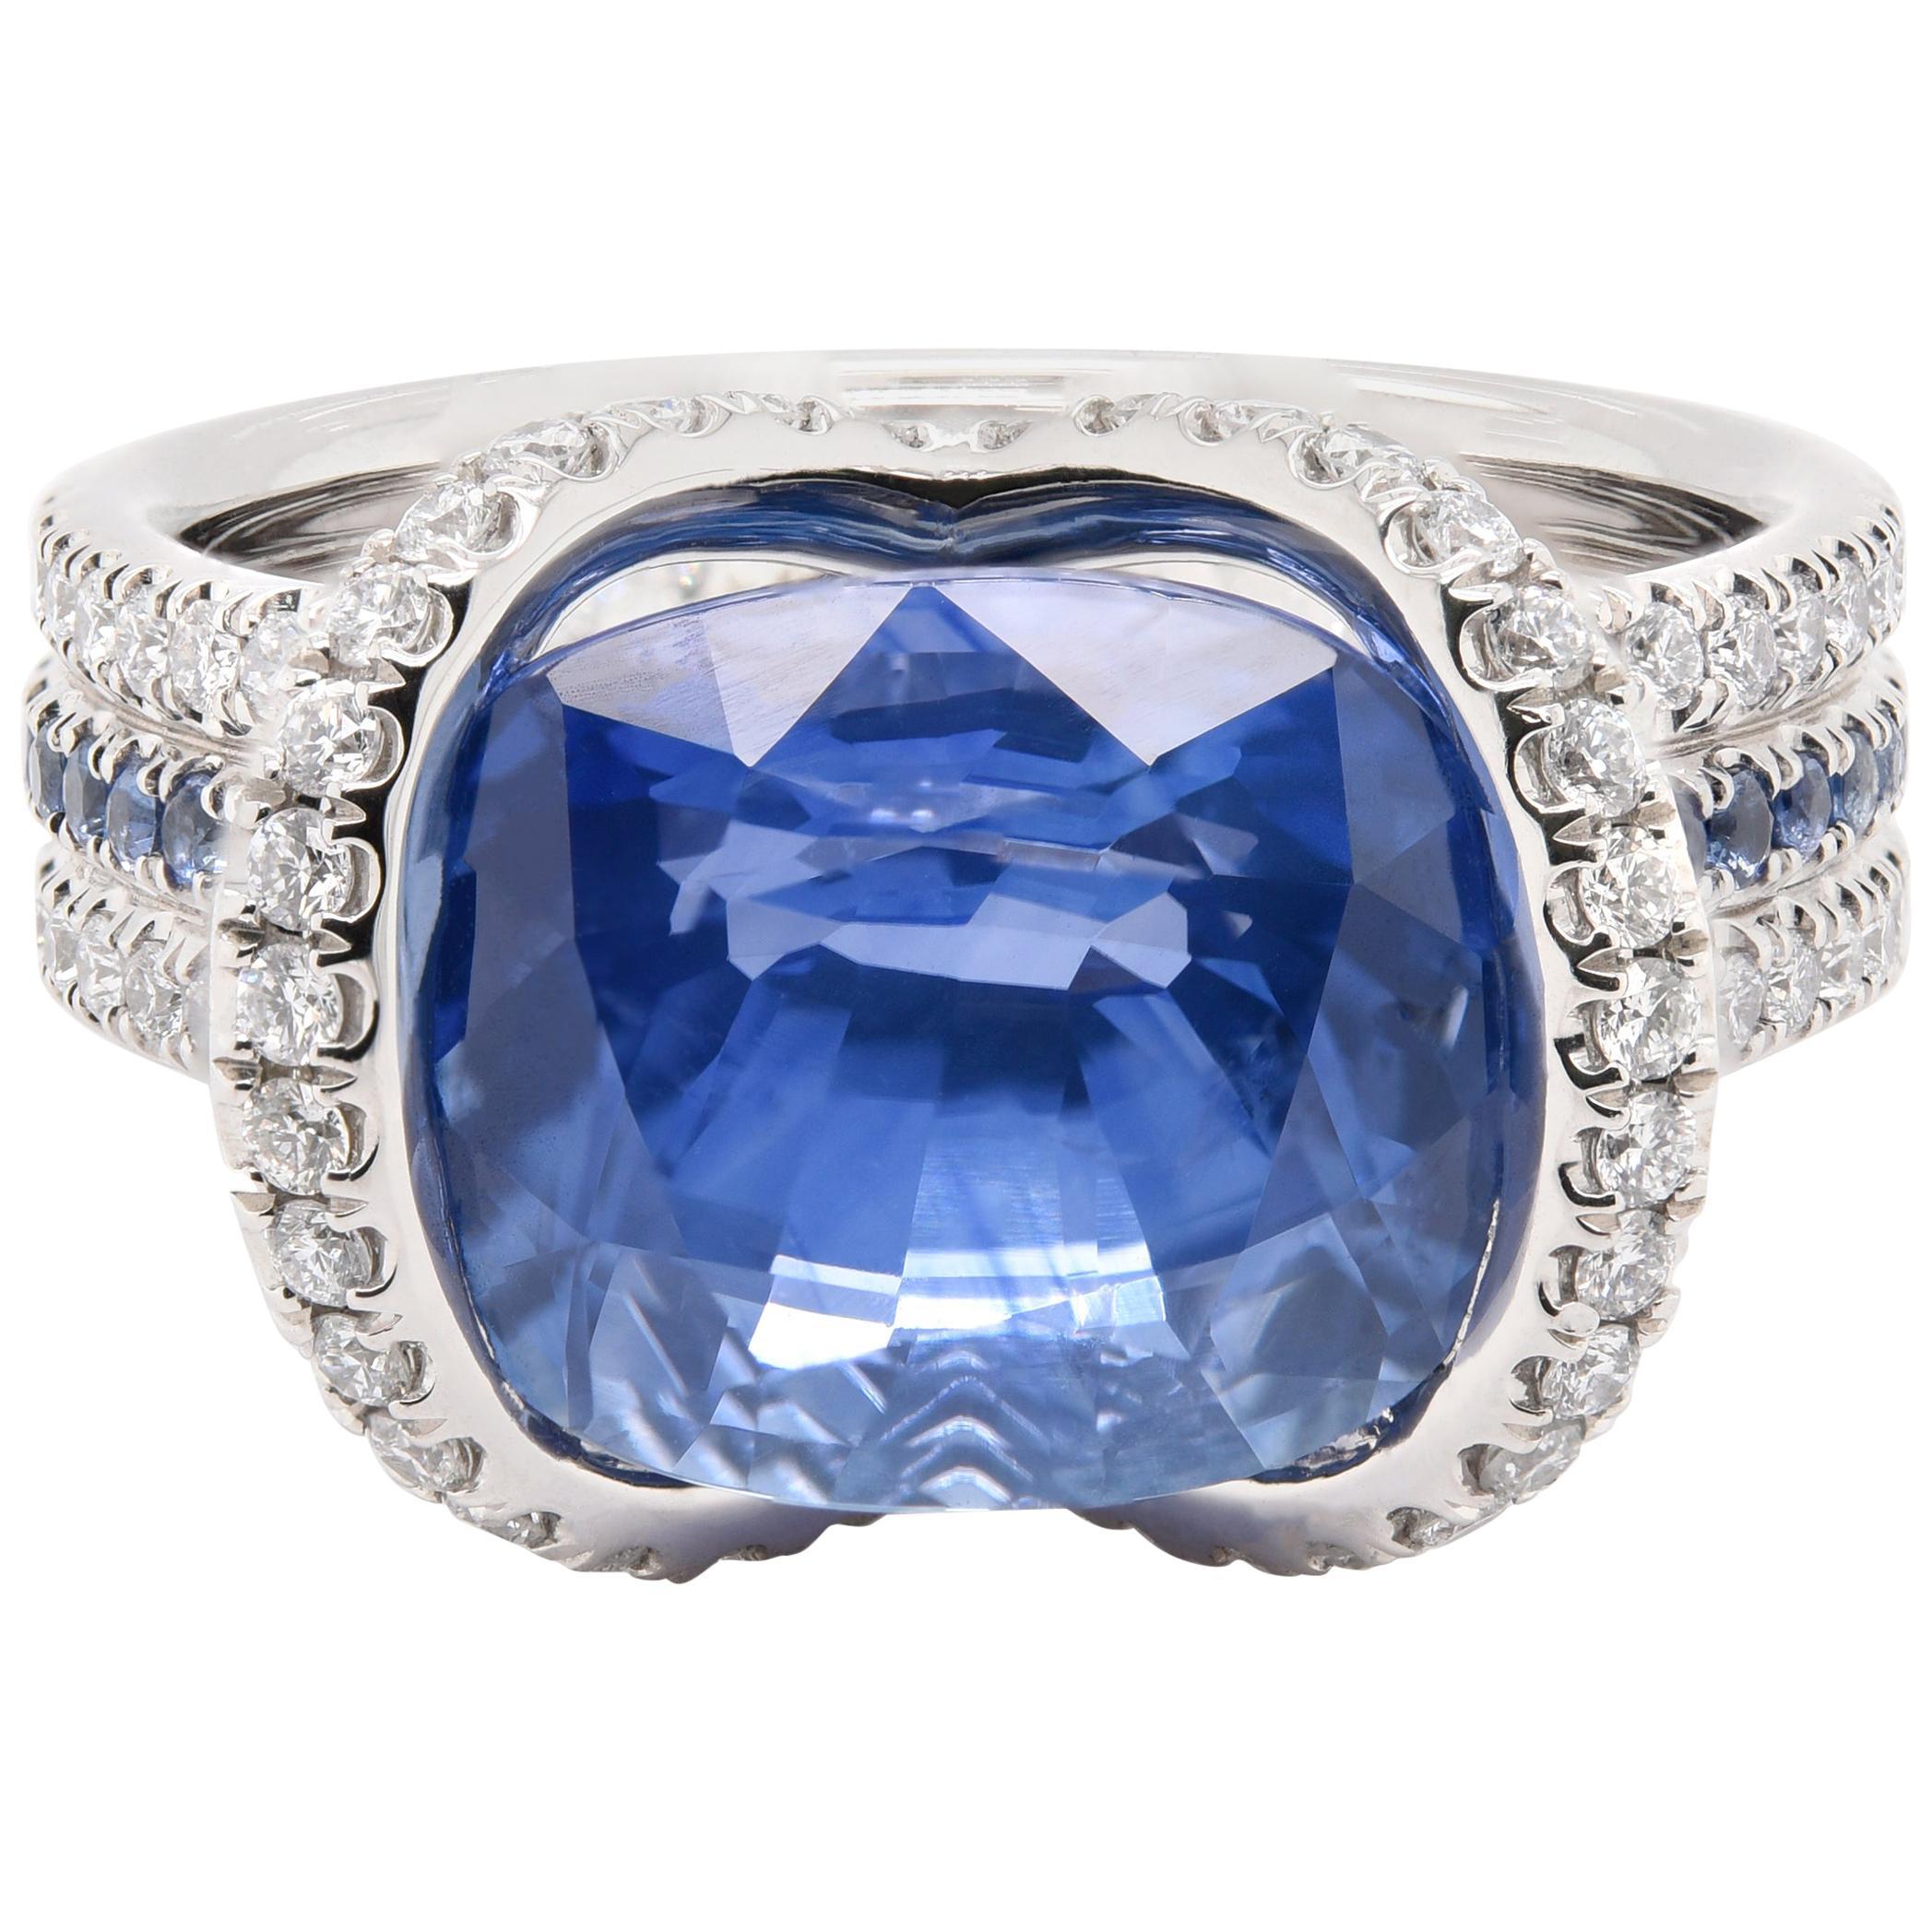 JAG New York Sapphire and Diamond Ring in Platinum